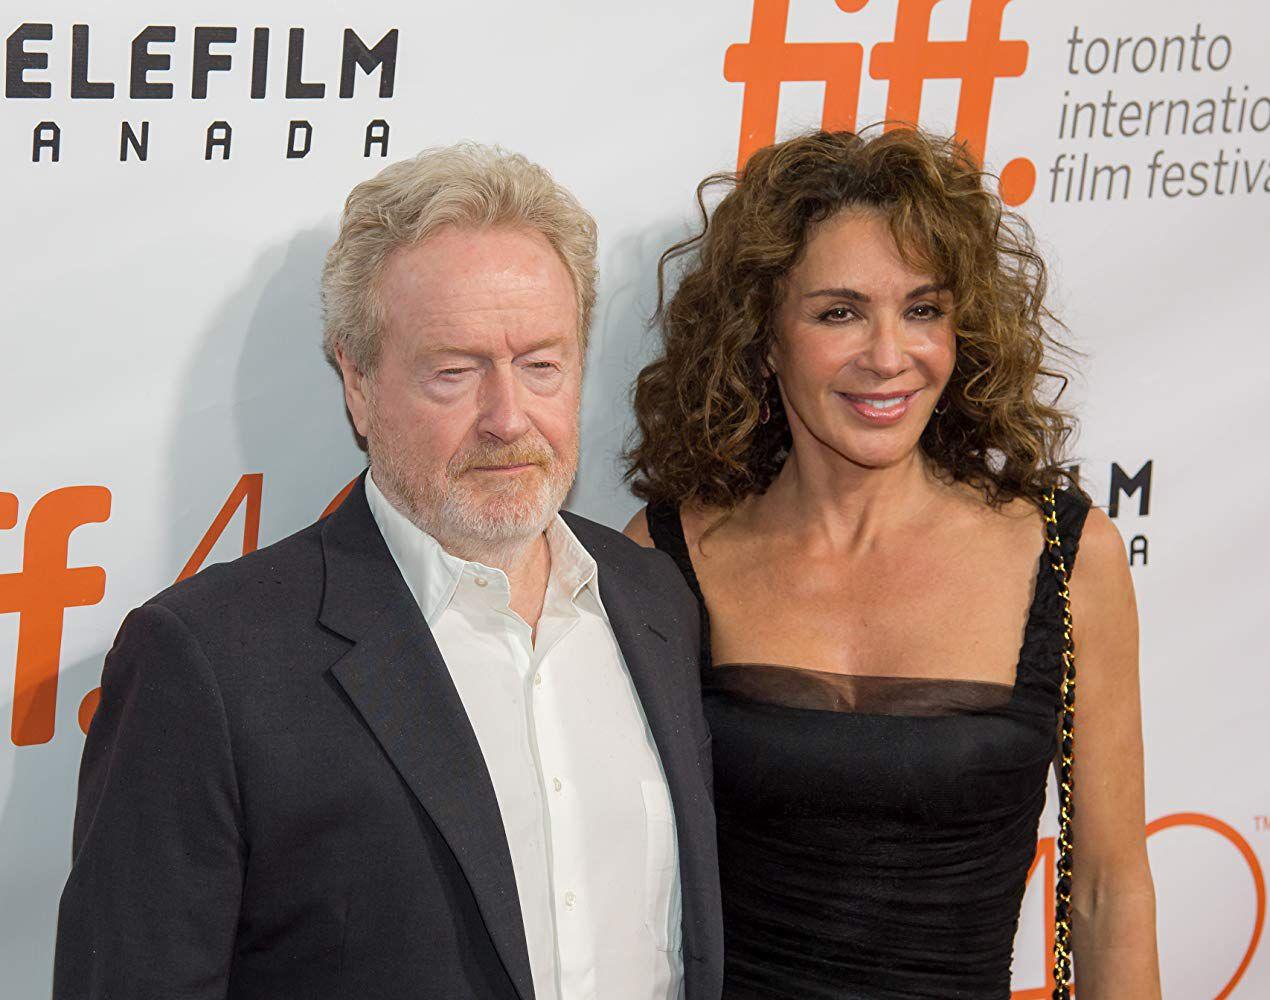 Giannina Scott és Ridley Scott gucci film